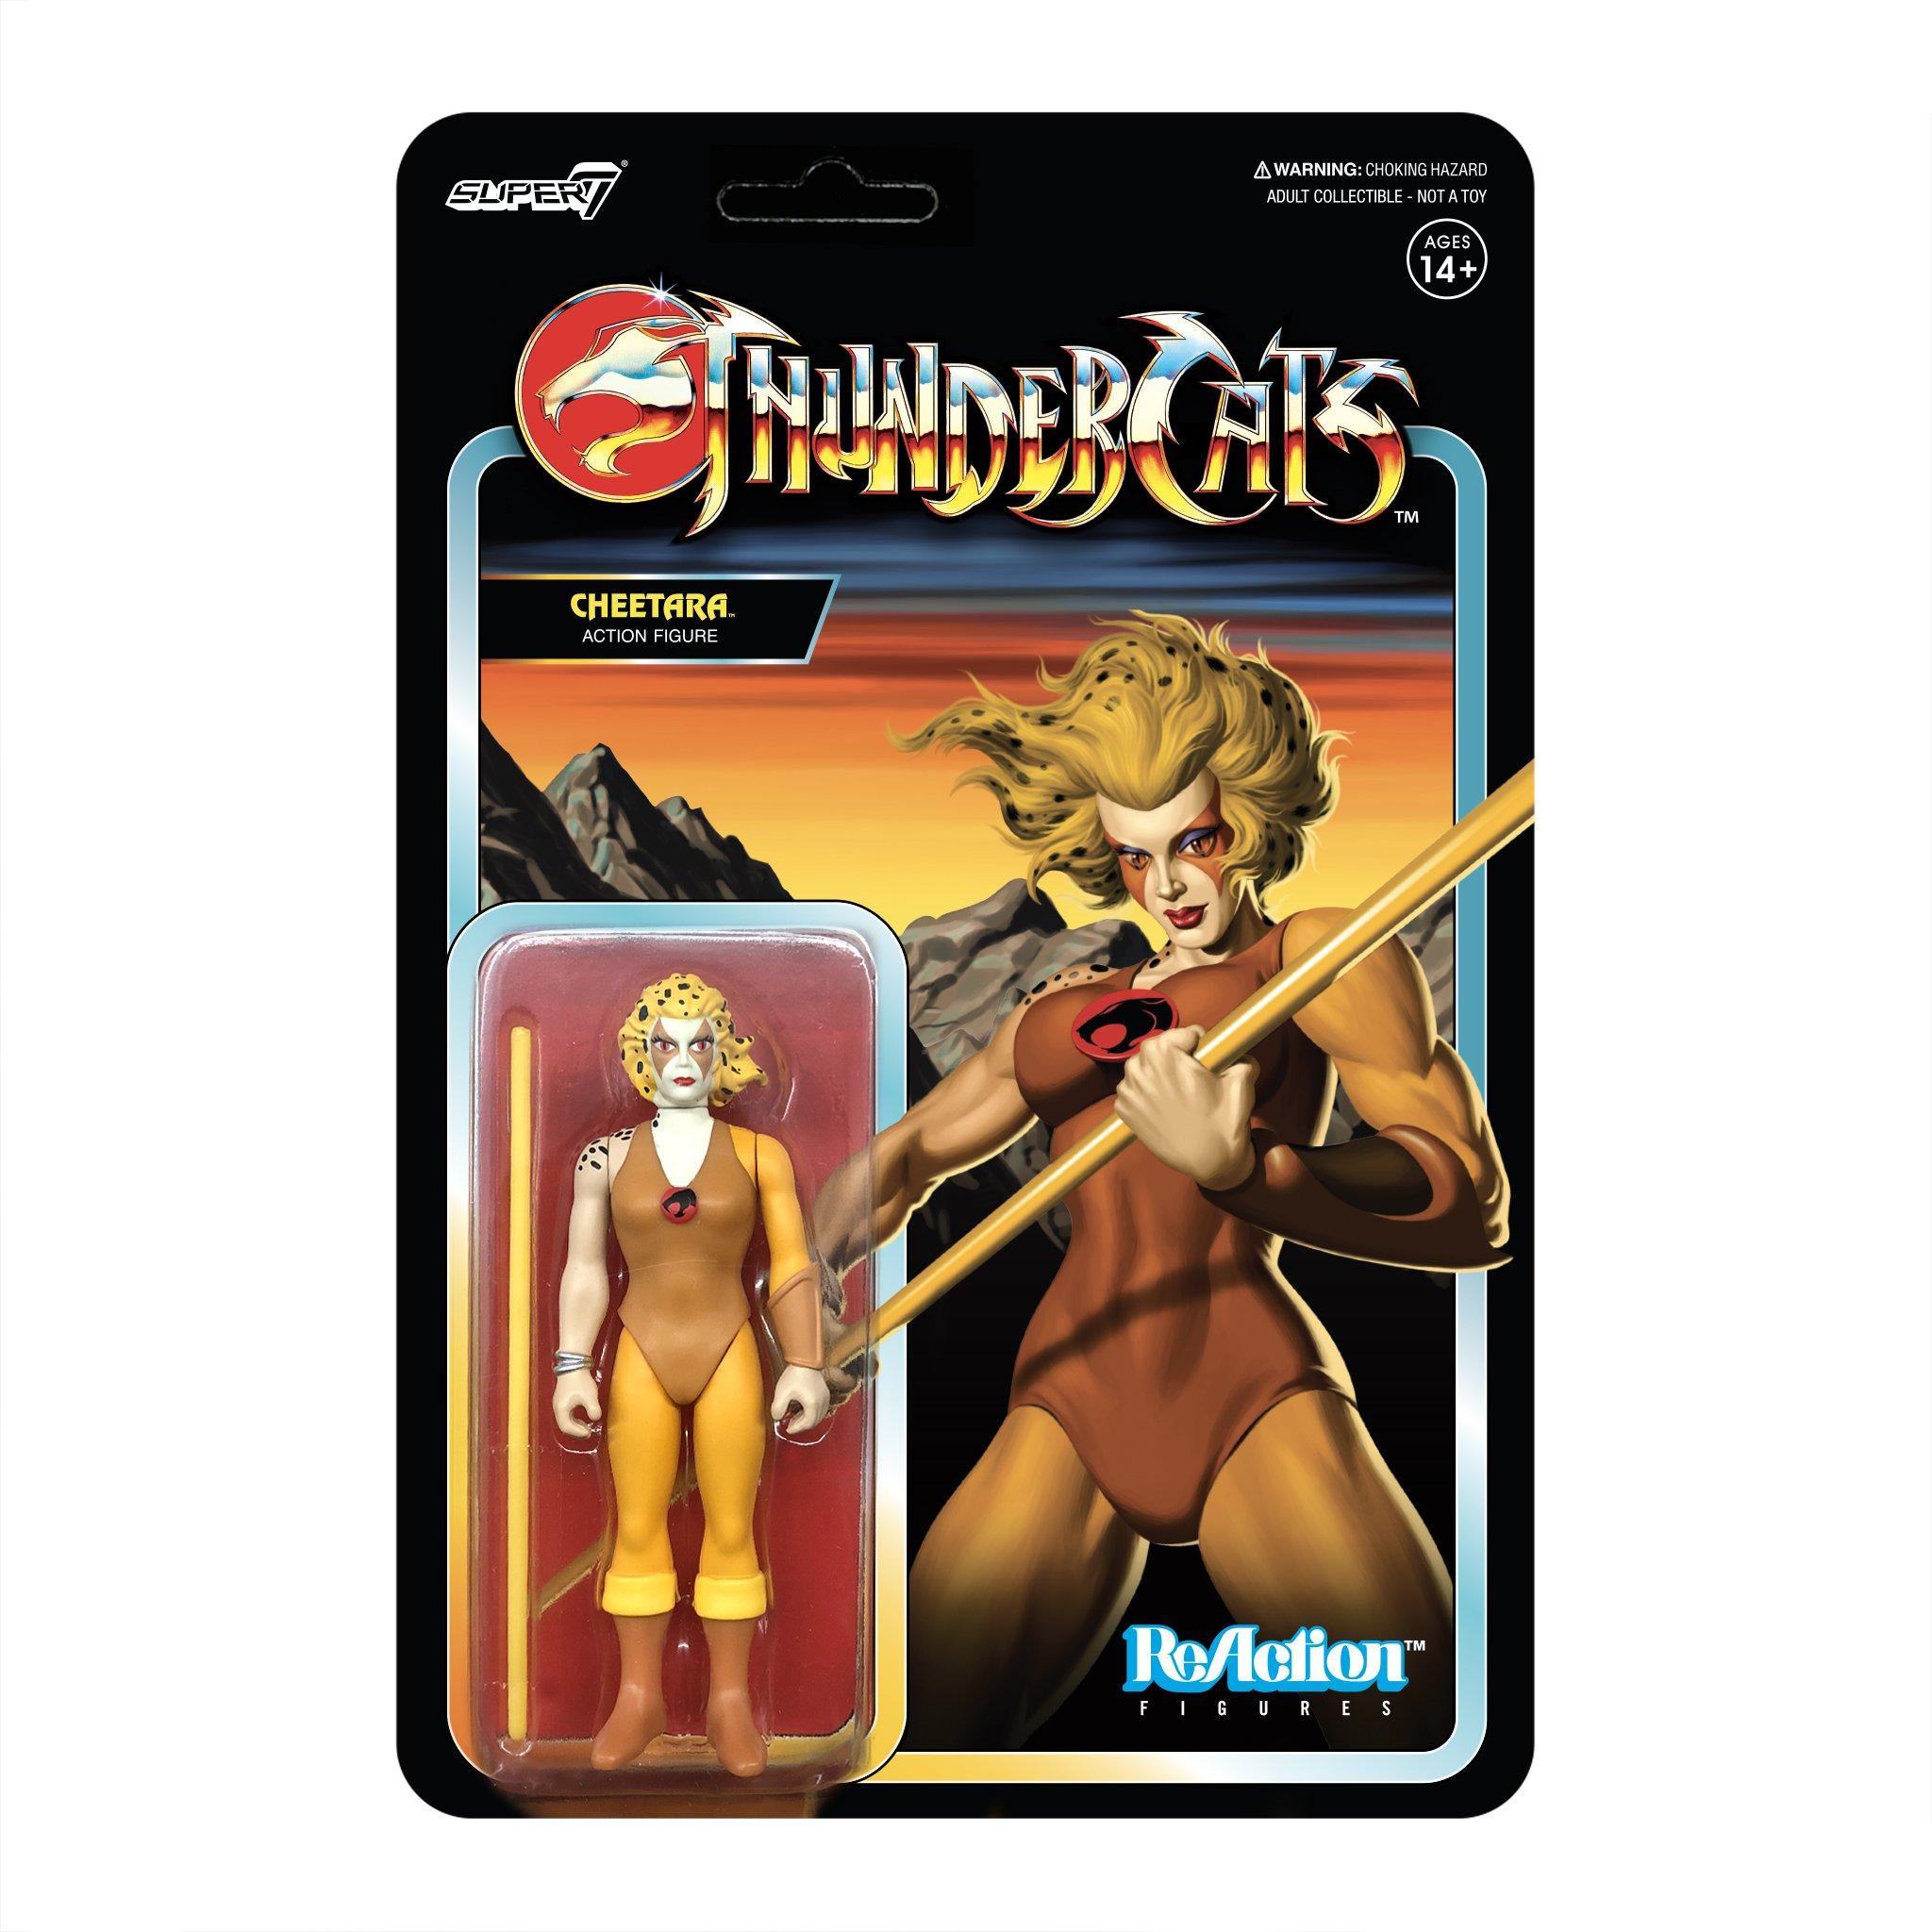 Thundercats: Cheetara Reaction Figure